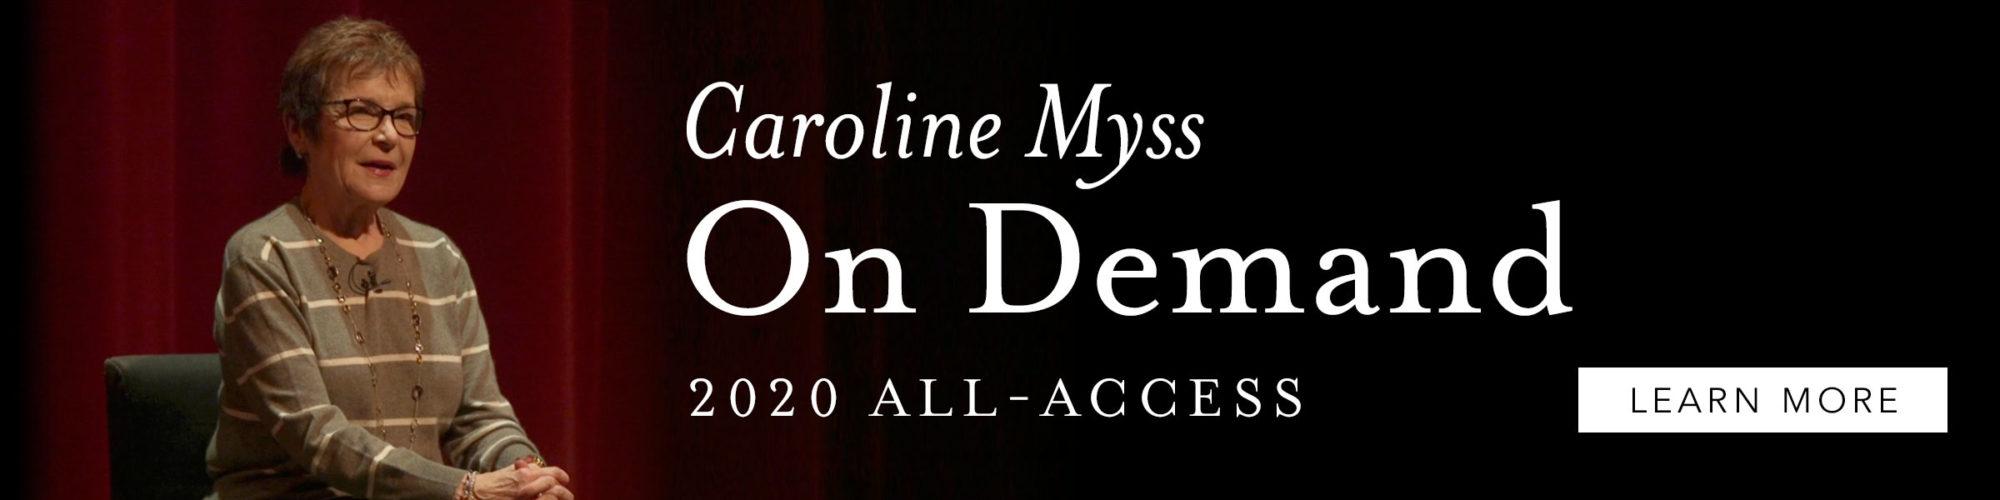 Caroline Myss On-Demand All Access 2020